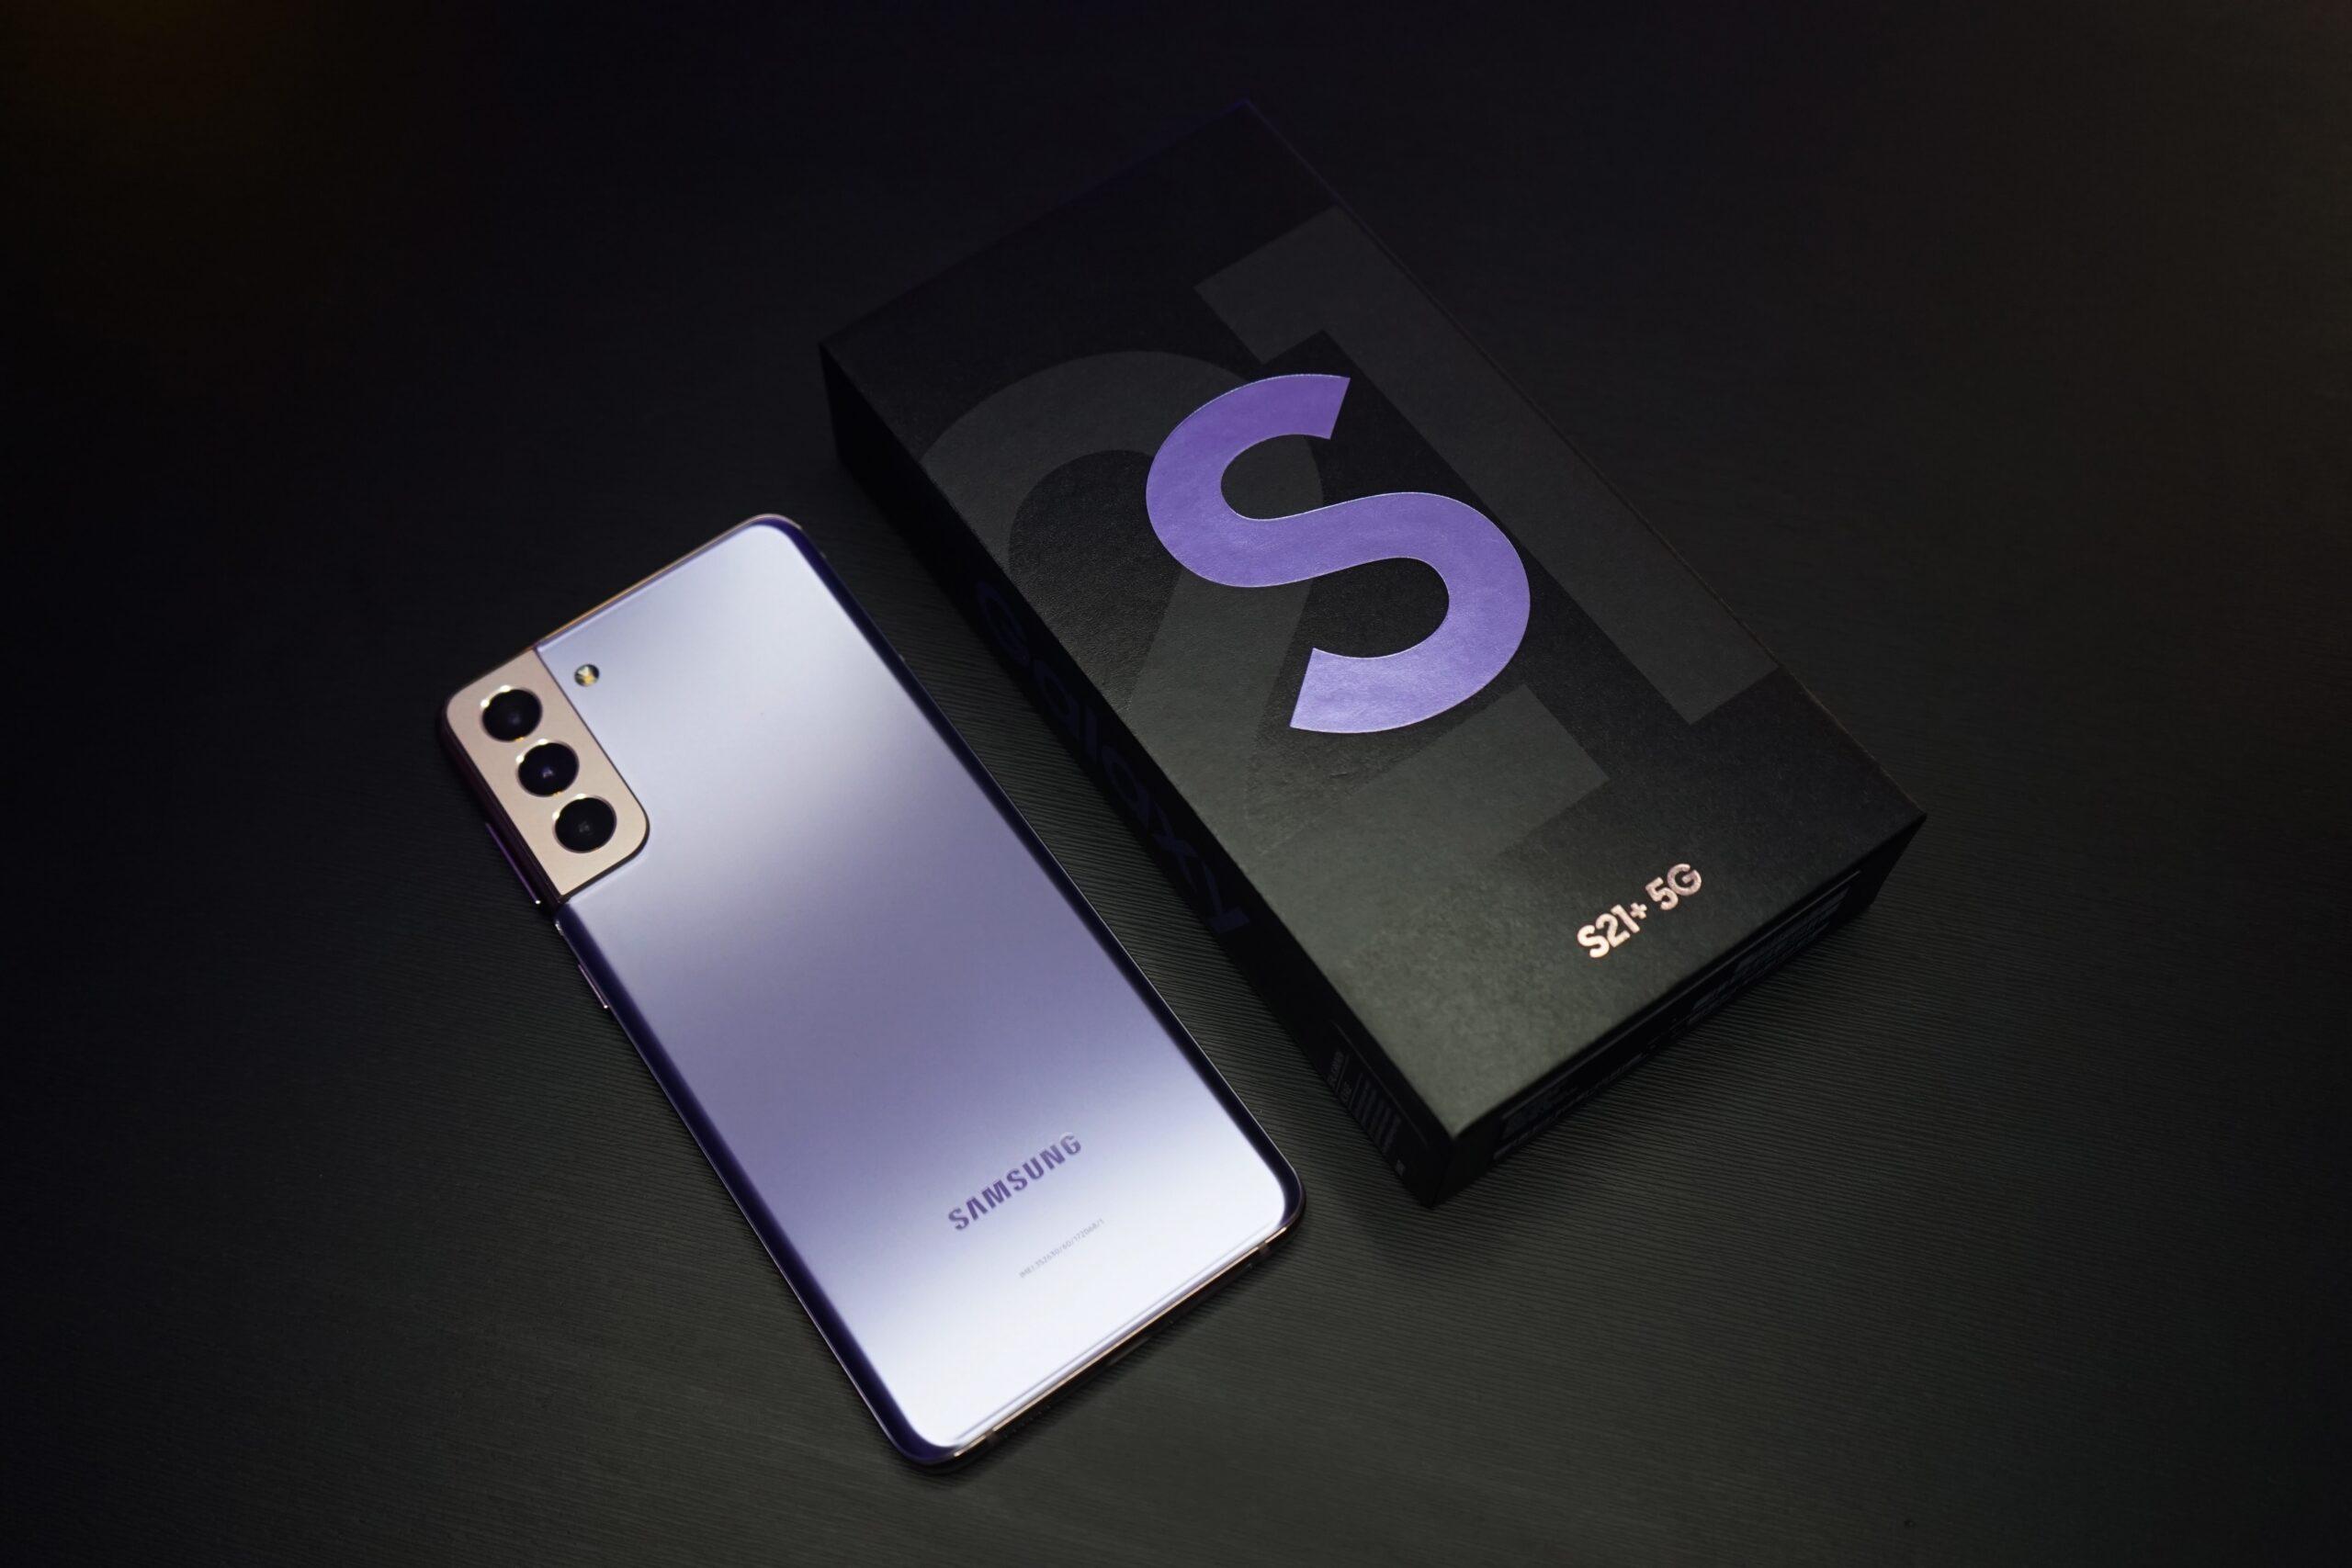 Fino a 150 euro di sconto sui Samsung Galaxy S21 da Unieuro thumbnail